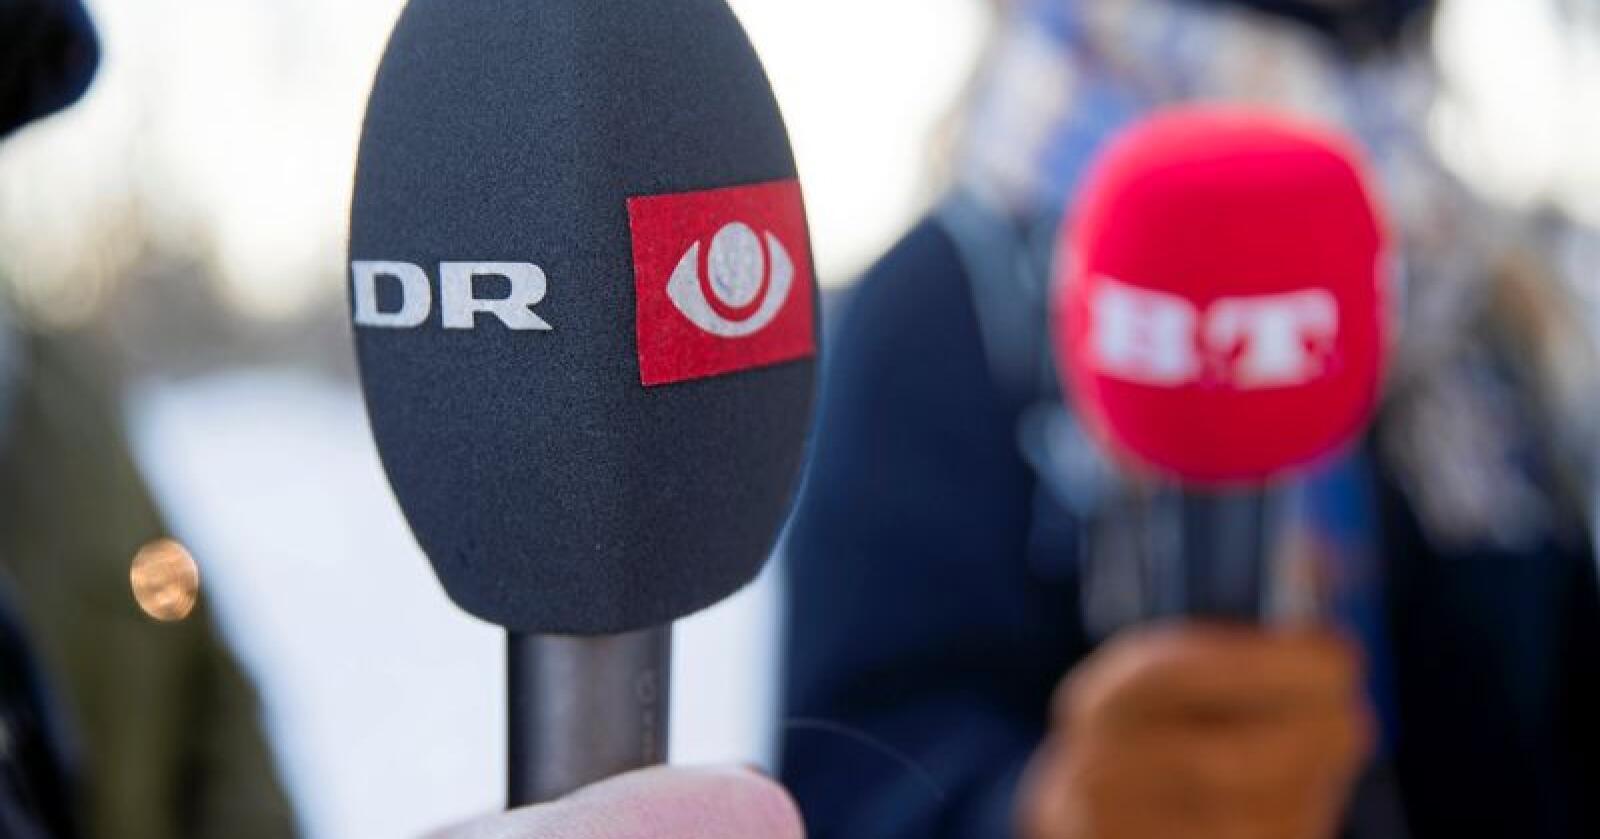 Den danske bondeorganisasjonen L&F klager Danmarks Radio inn til pressens klageorgan i Danmark. Foto: Berit Roald / NTB scanpix